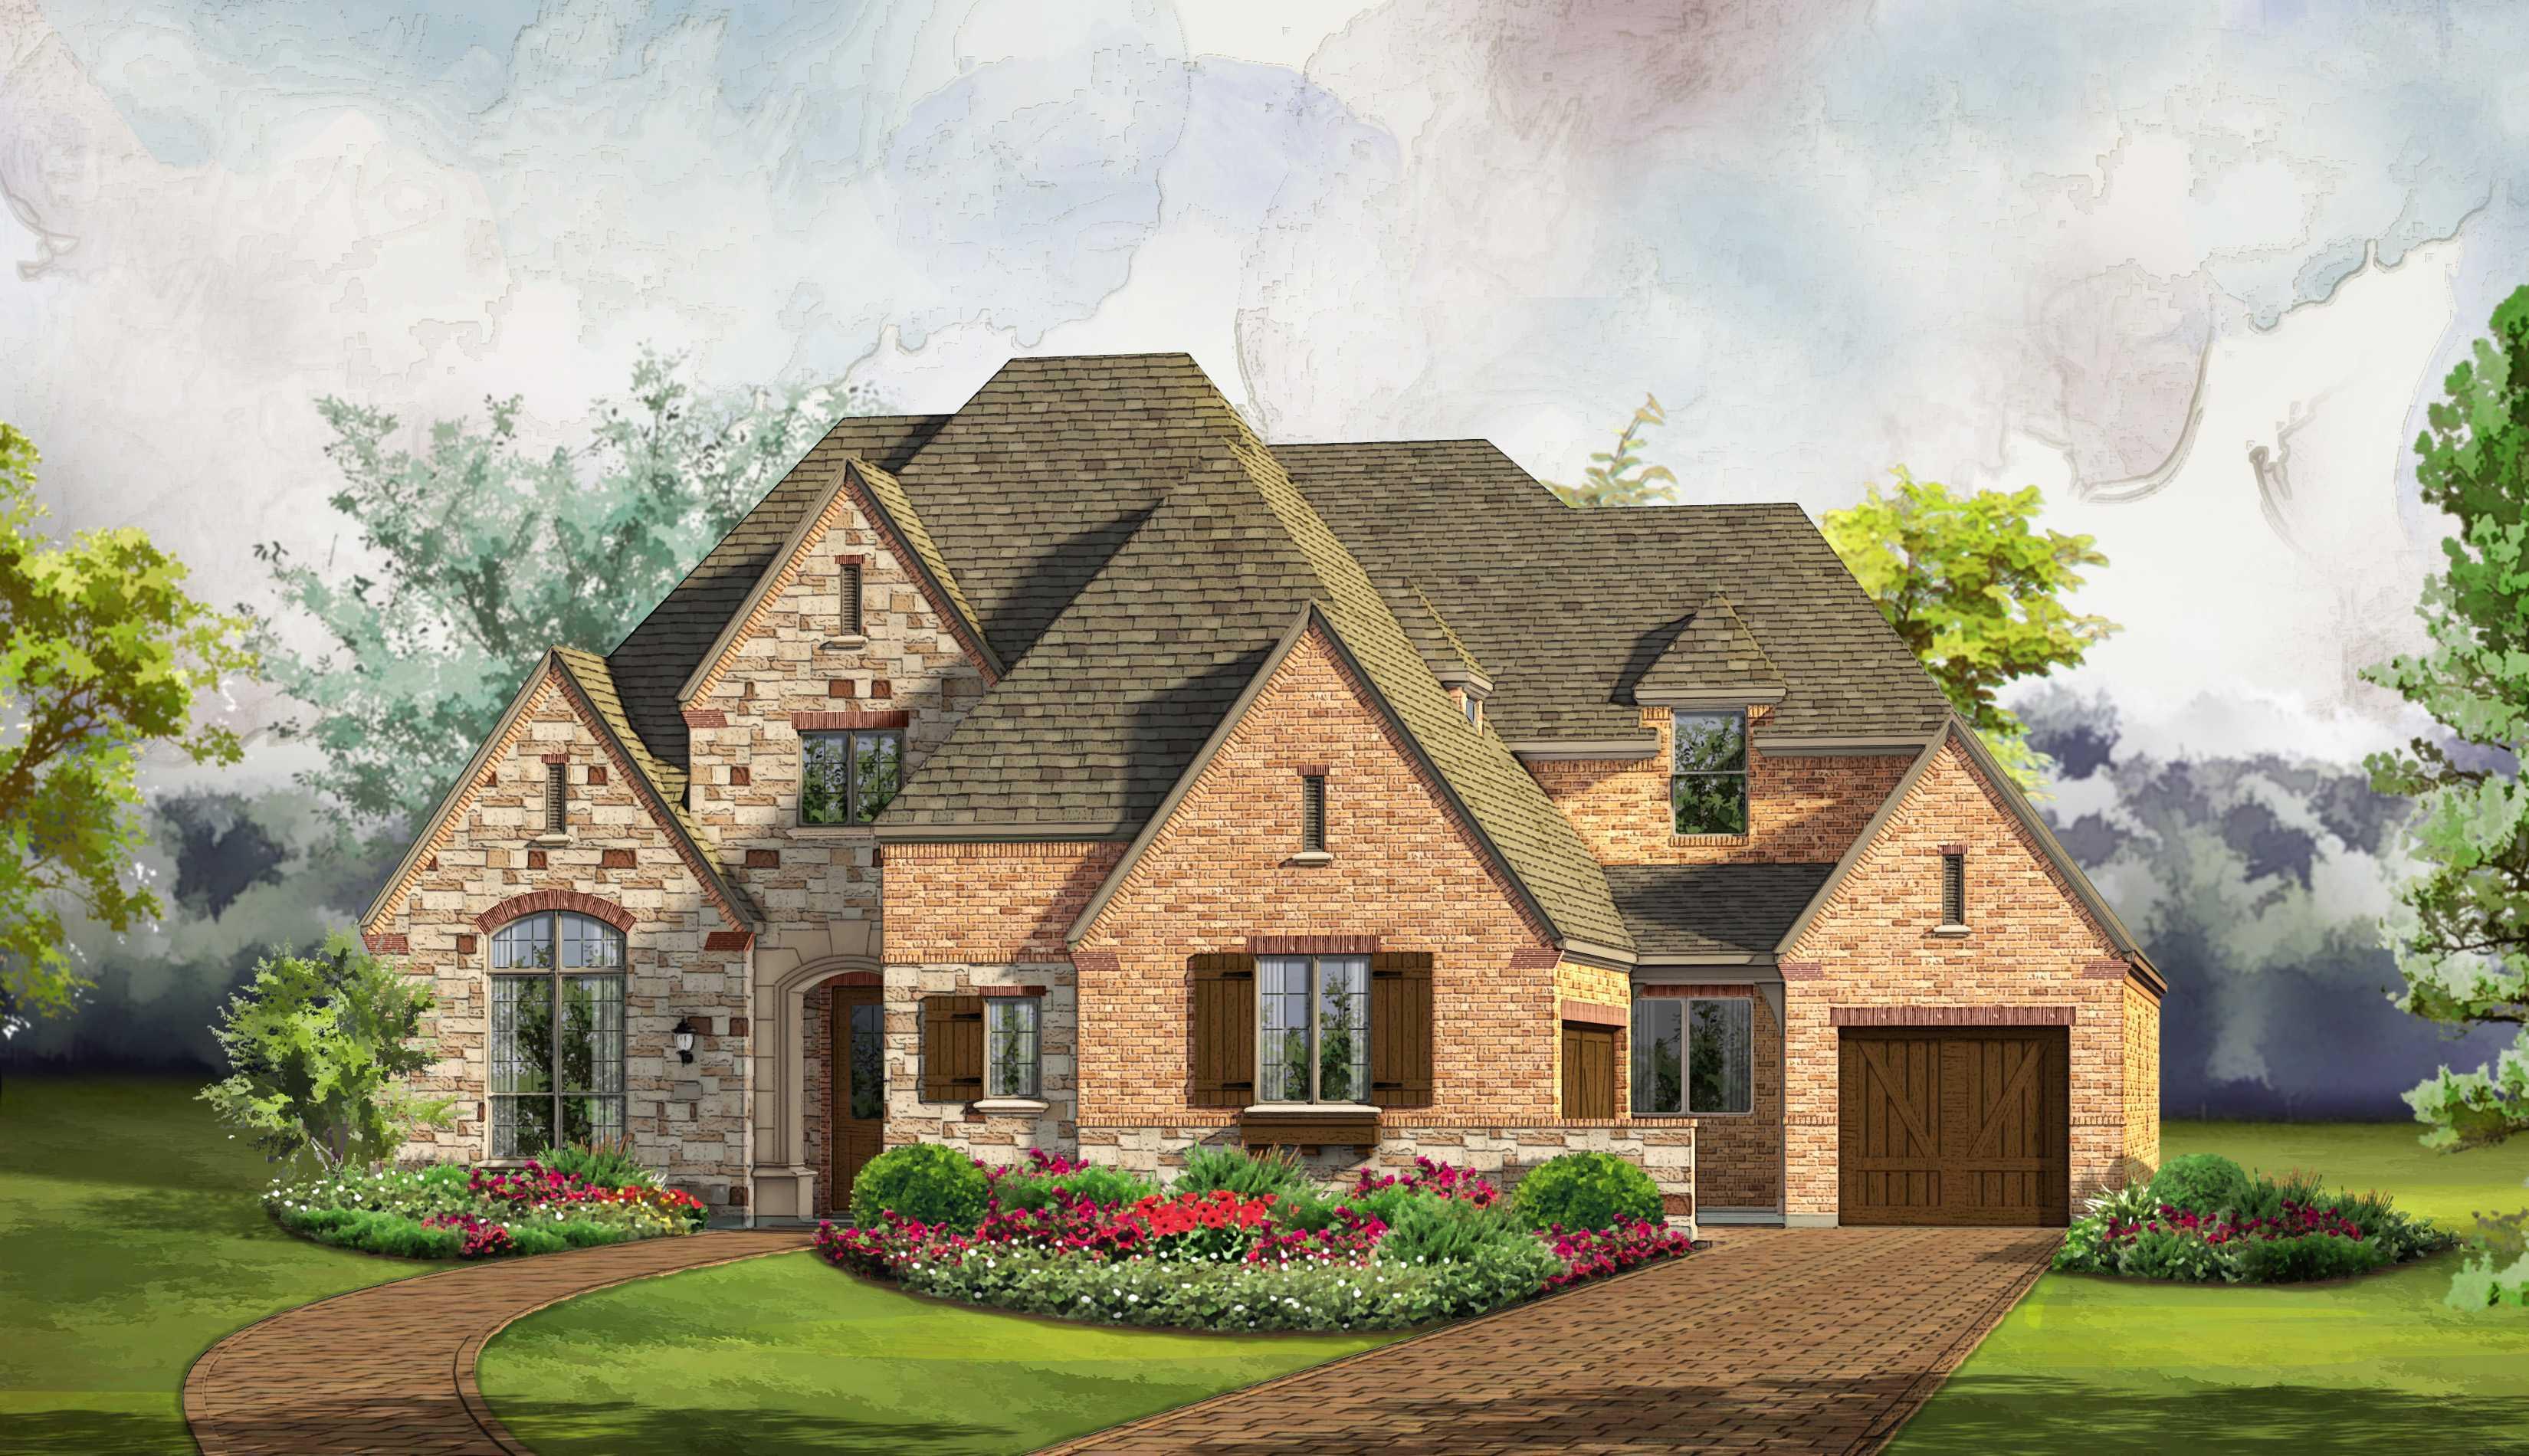 Single Family for Sale at Regency Park - Plan 3620 4012 Baldomera Street Flower Mound, Texas 75022 United States